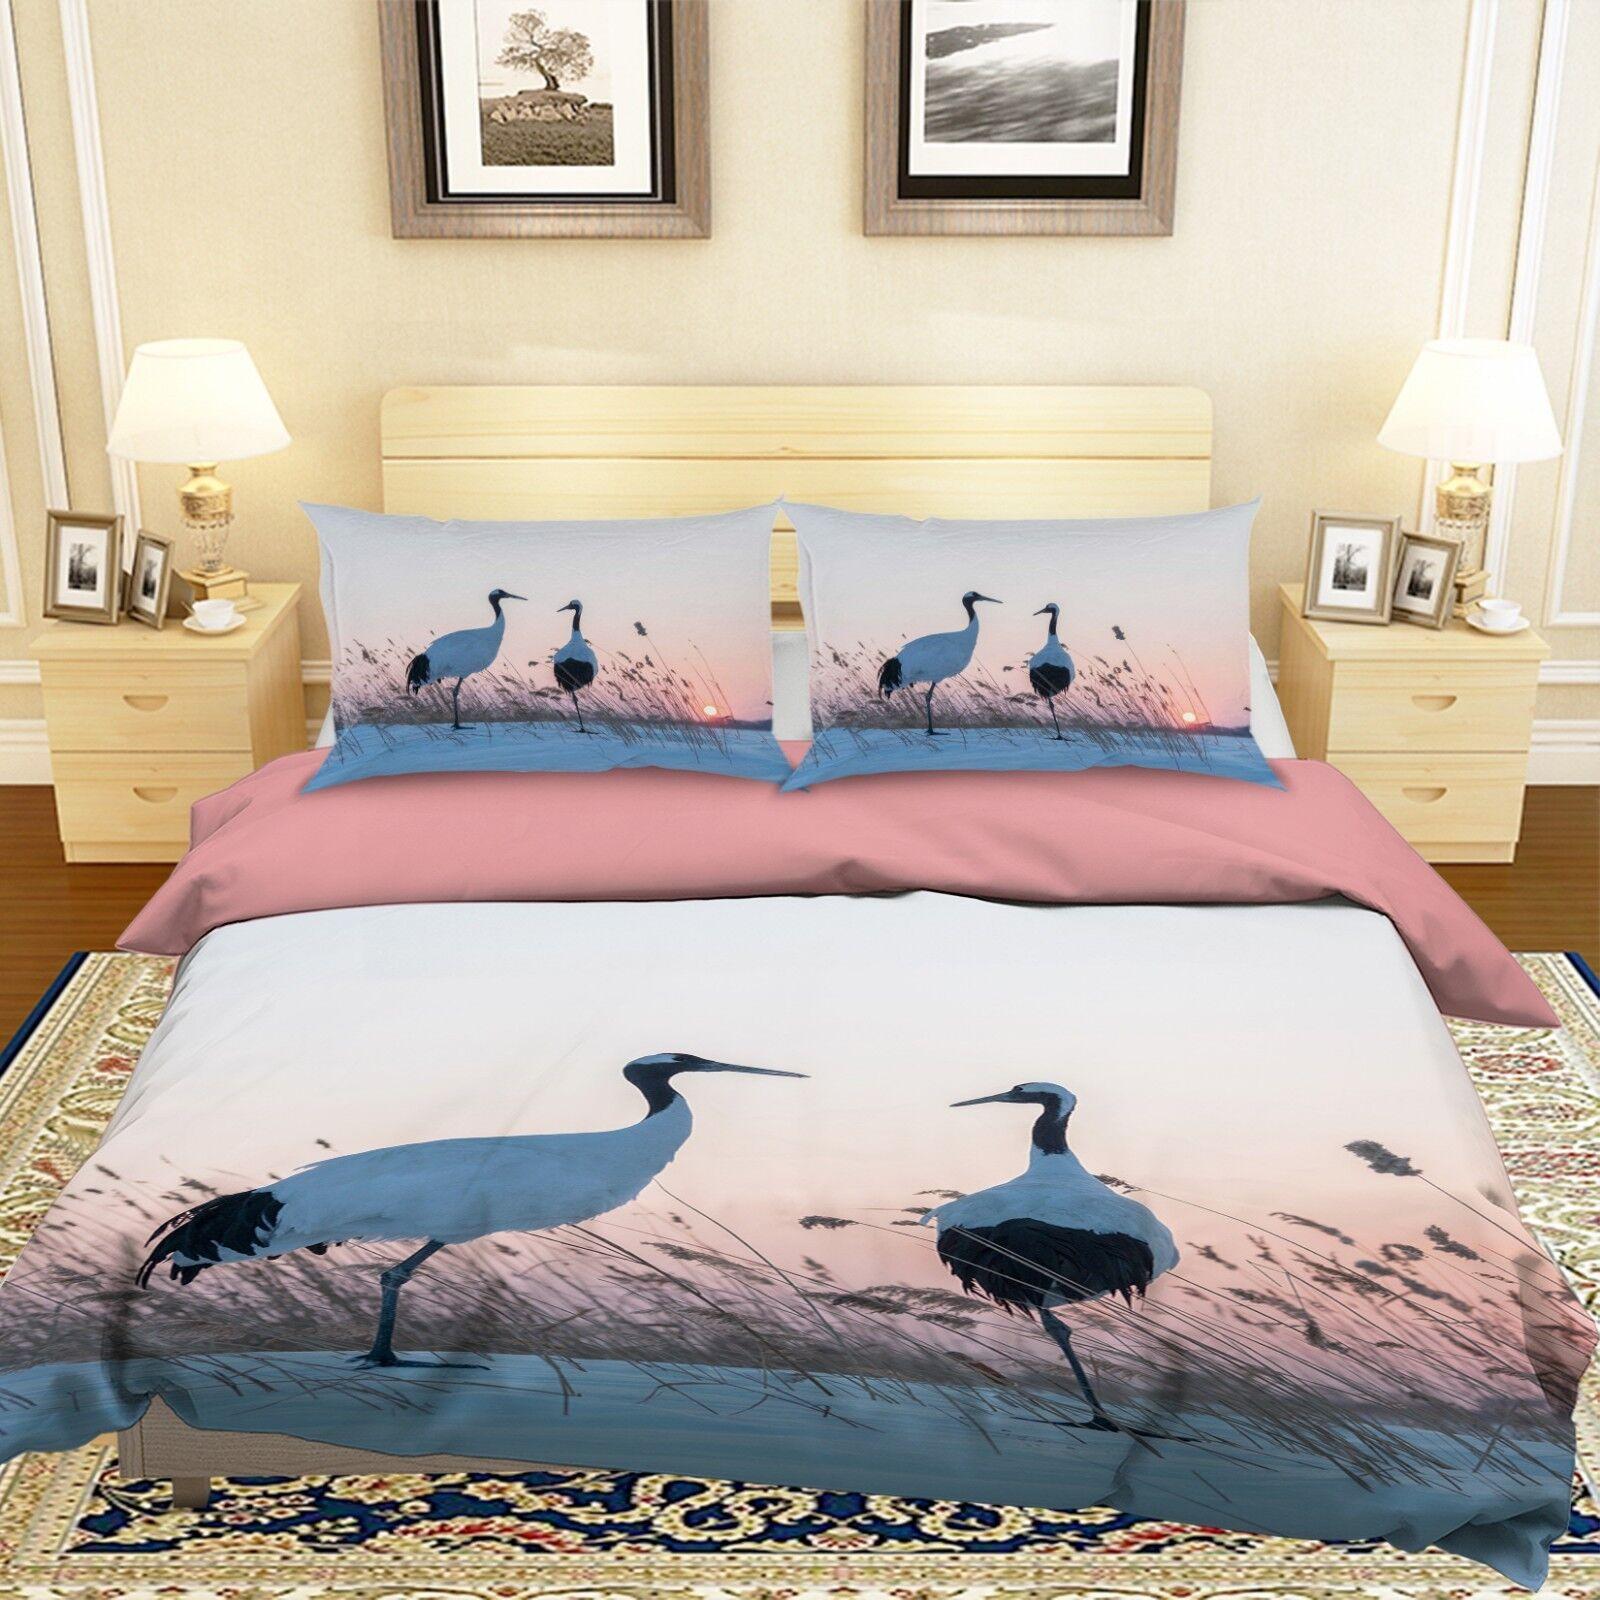 3D Weiß Crane 19 Bett Pillowcases Quilt Duvet Startseite Set Single König Größe UK